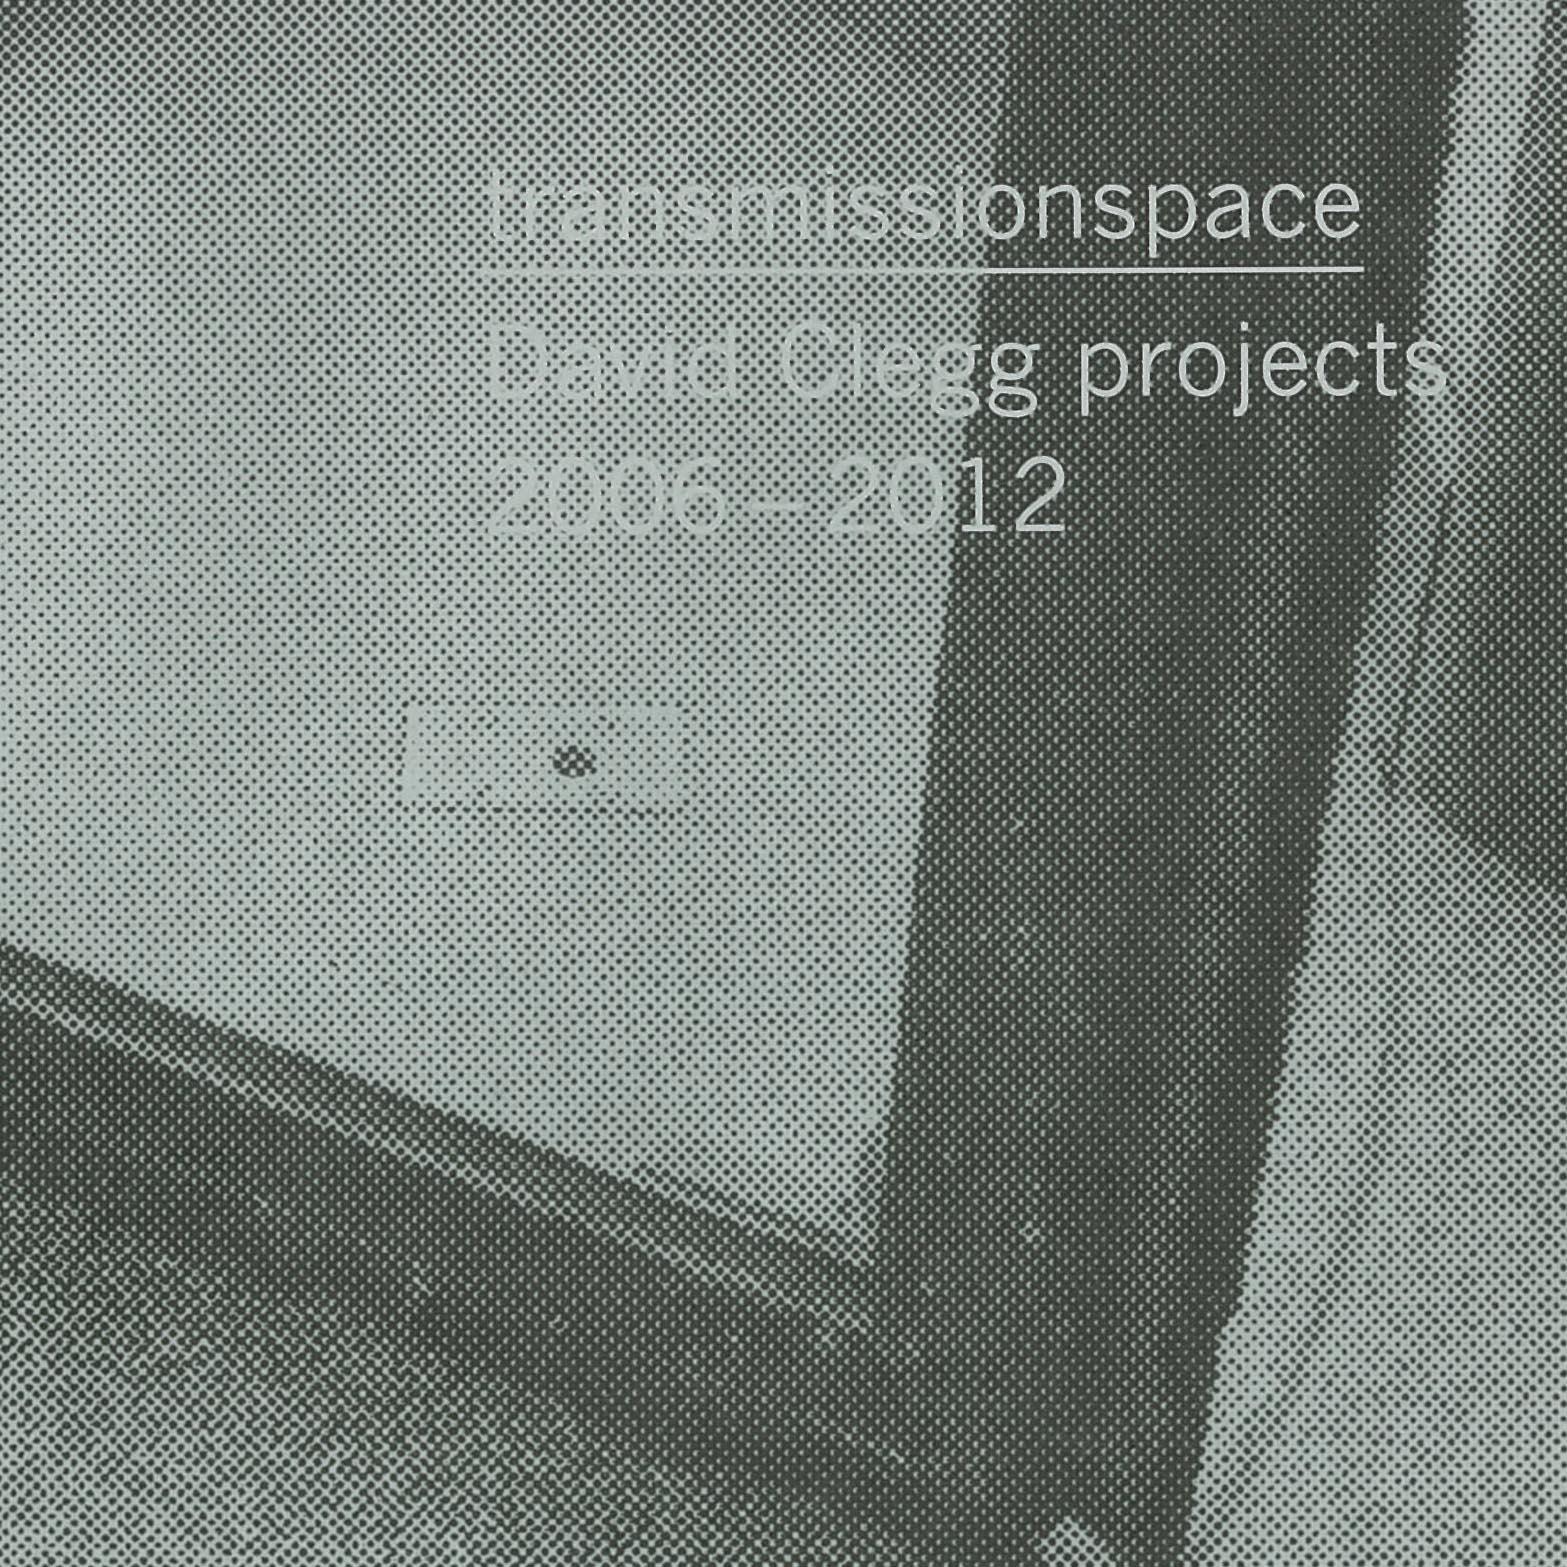 transmissionspace500x500